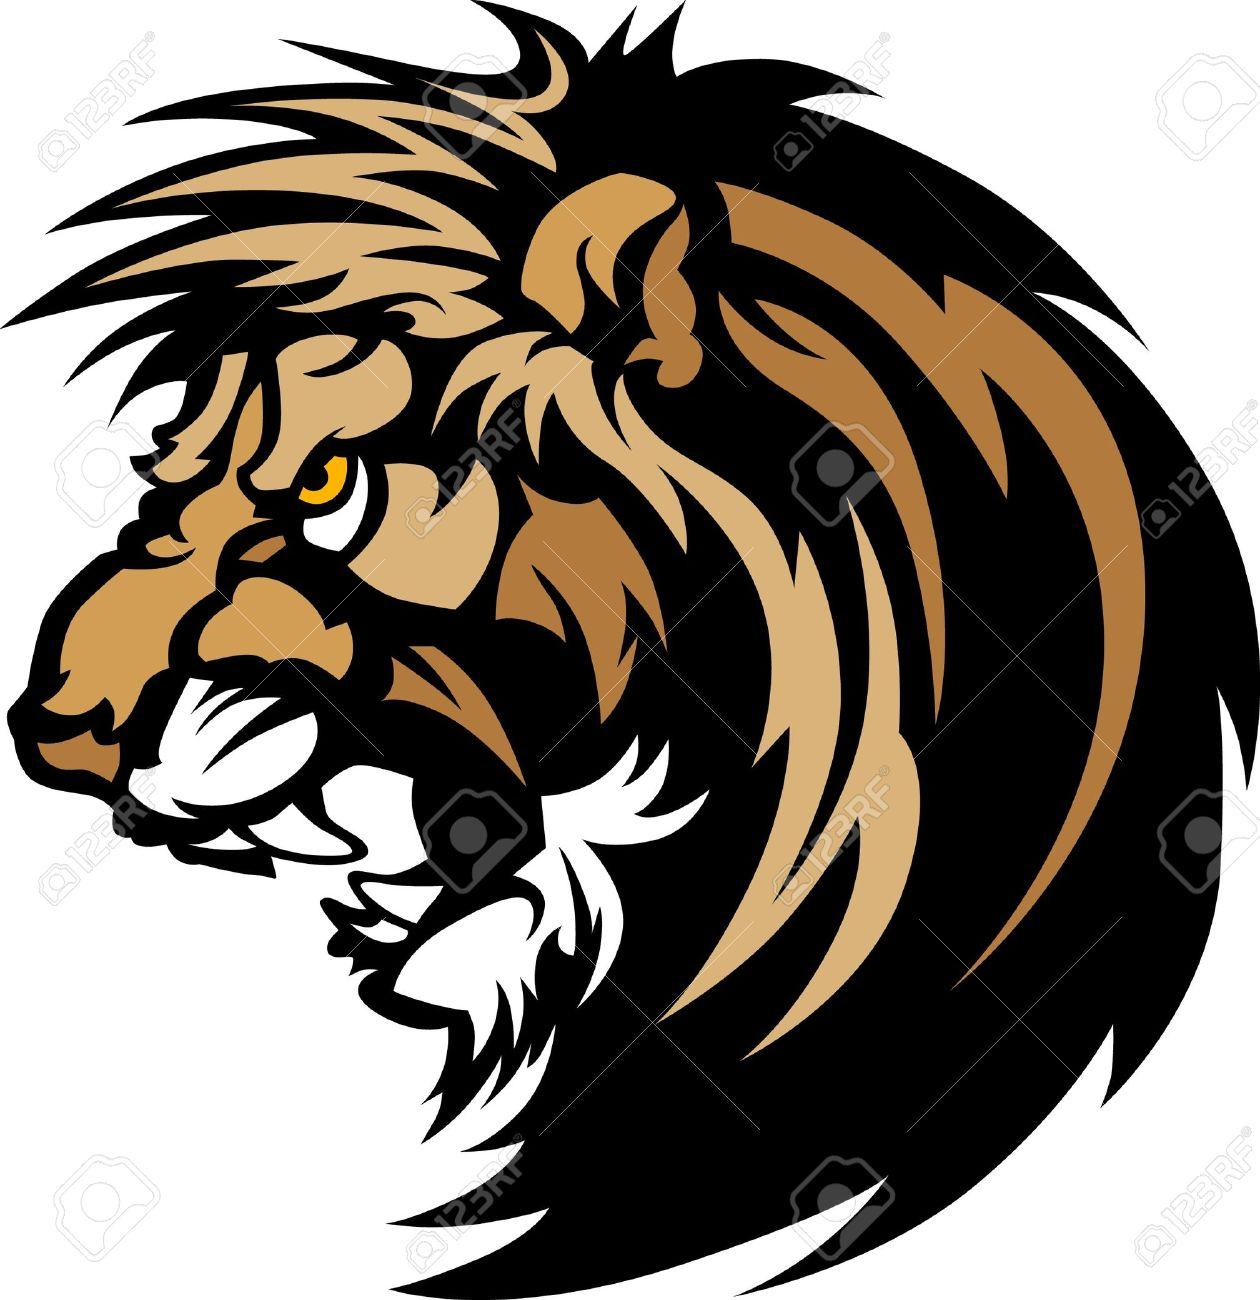 1260x1300 Lion Head Graphic Mascot Logo Royalty Free Cliparts, Vectors,